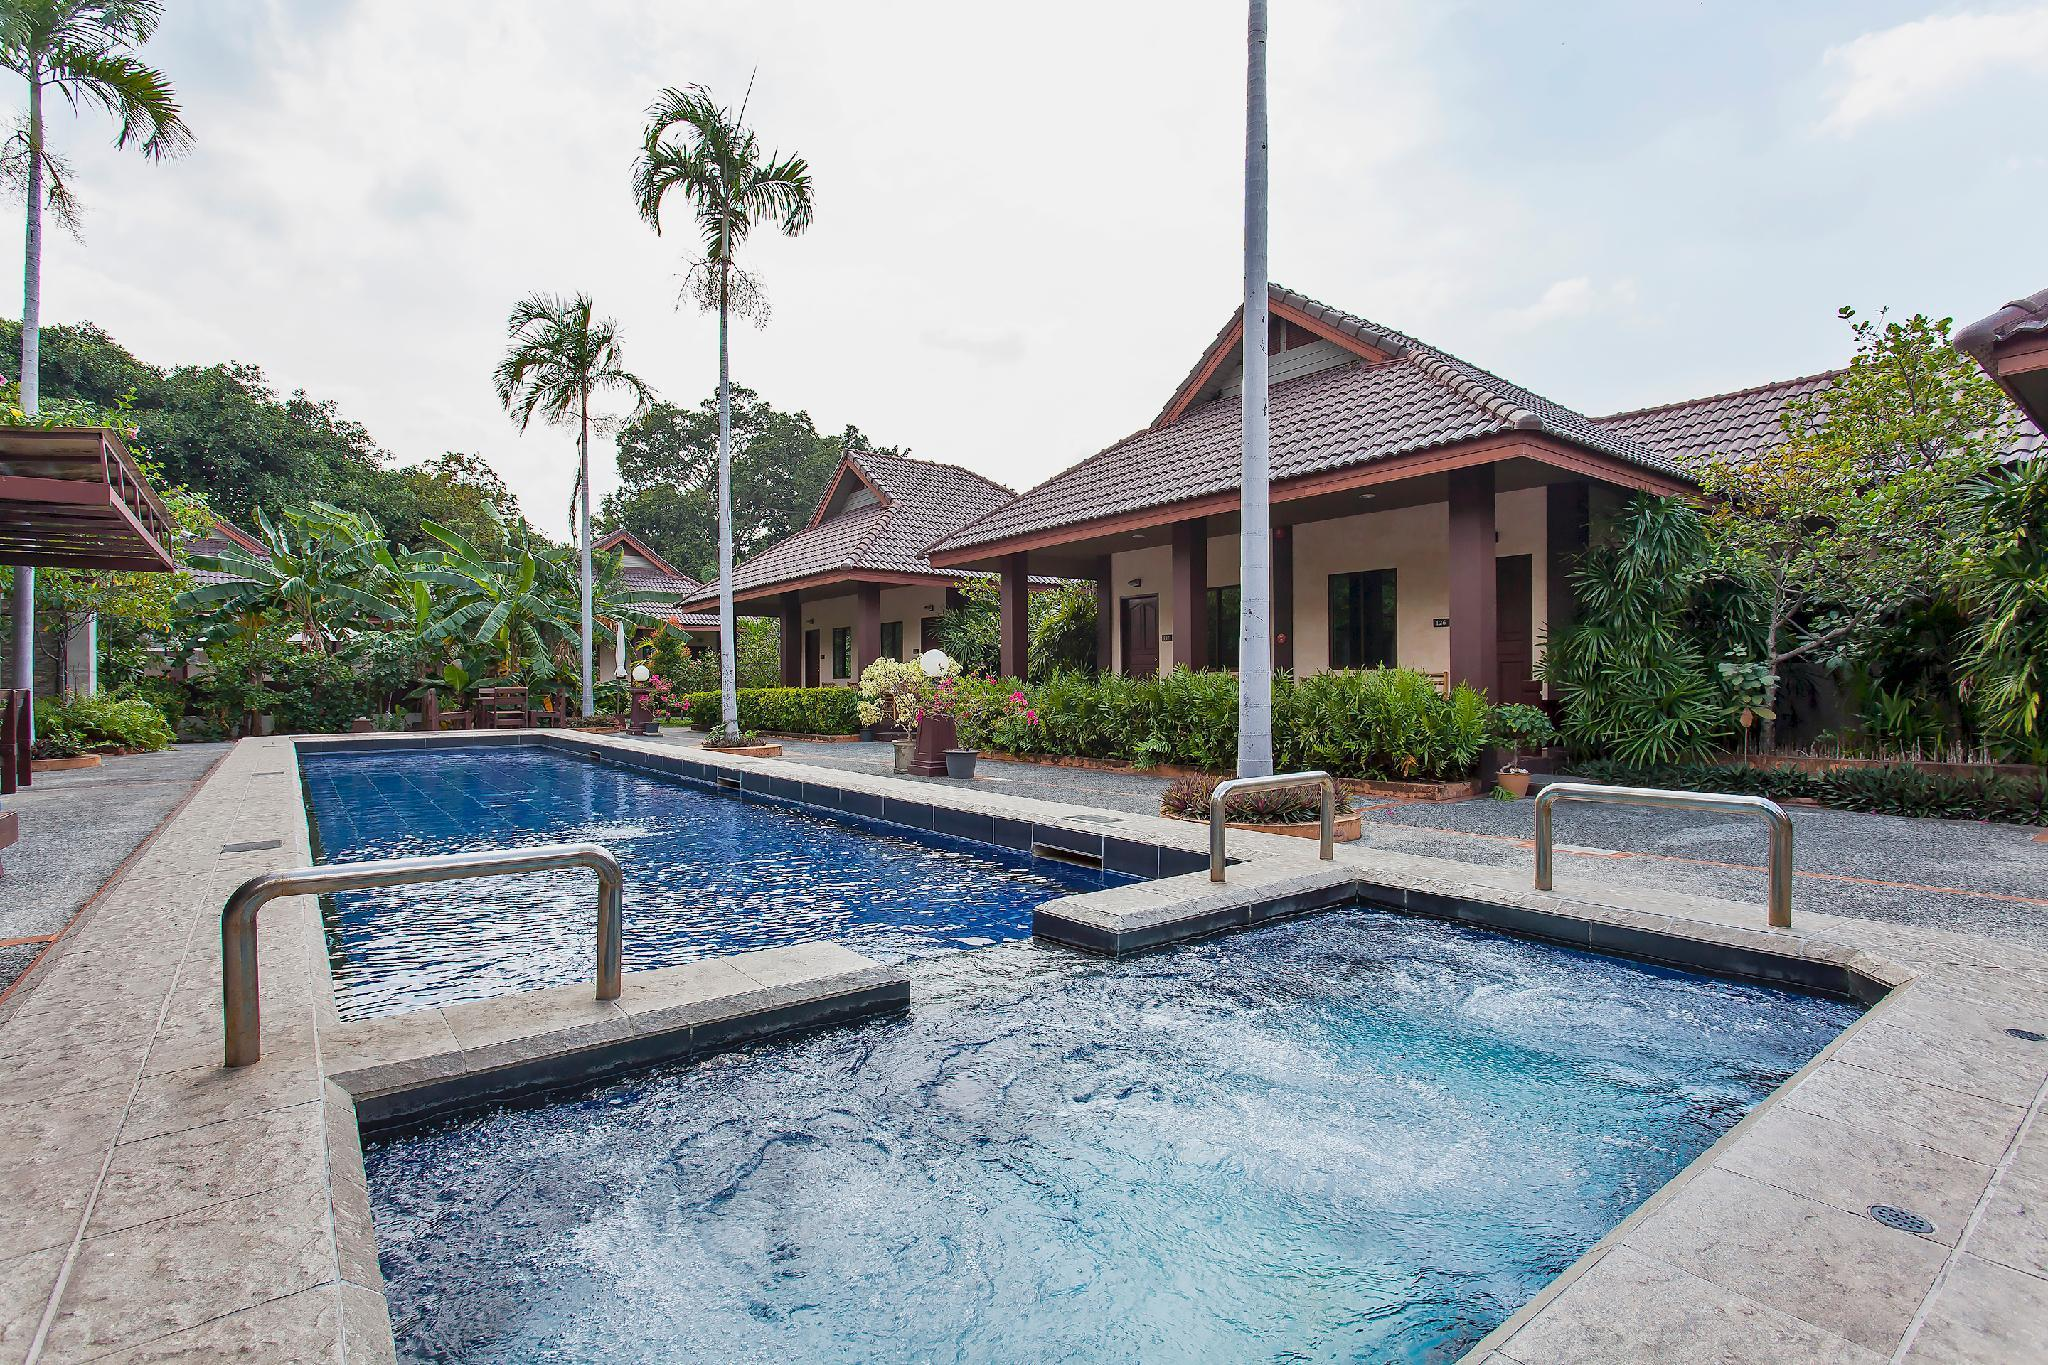 Emerald Resort | 10BR Pool Resort 750m to Beach วิลลา 10 ห้องนอน 10 ห้องน้ำส่วนตัว ขนาด 790 ตร.ม. – พัทยาเหนือ